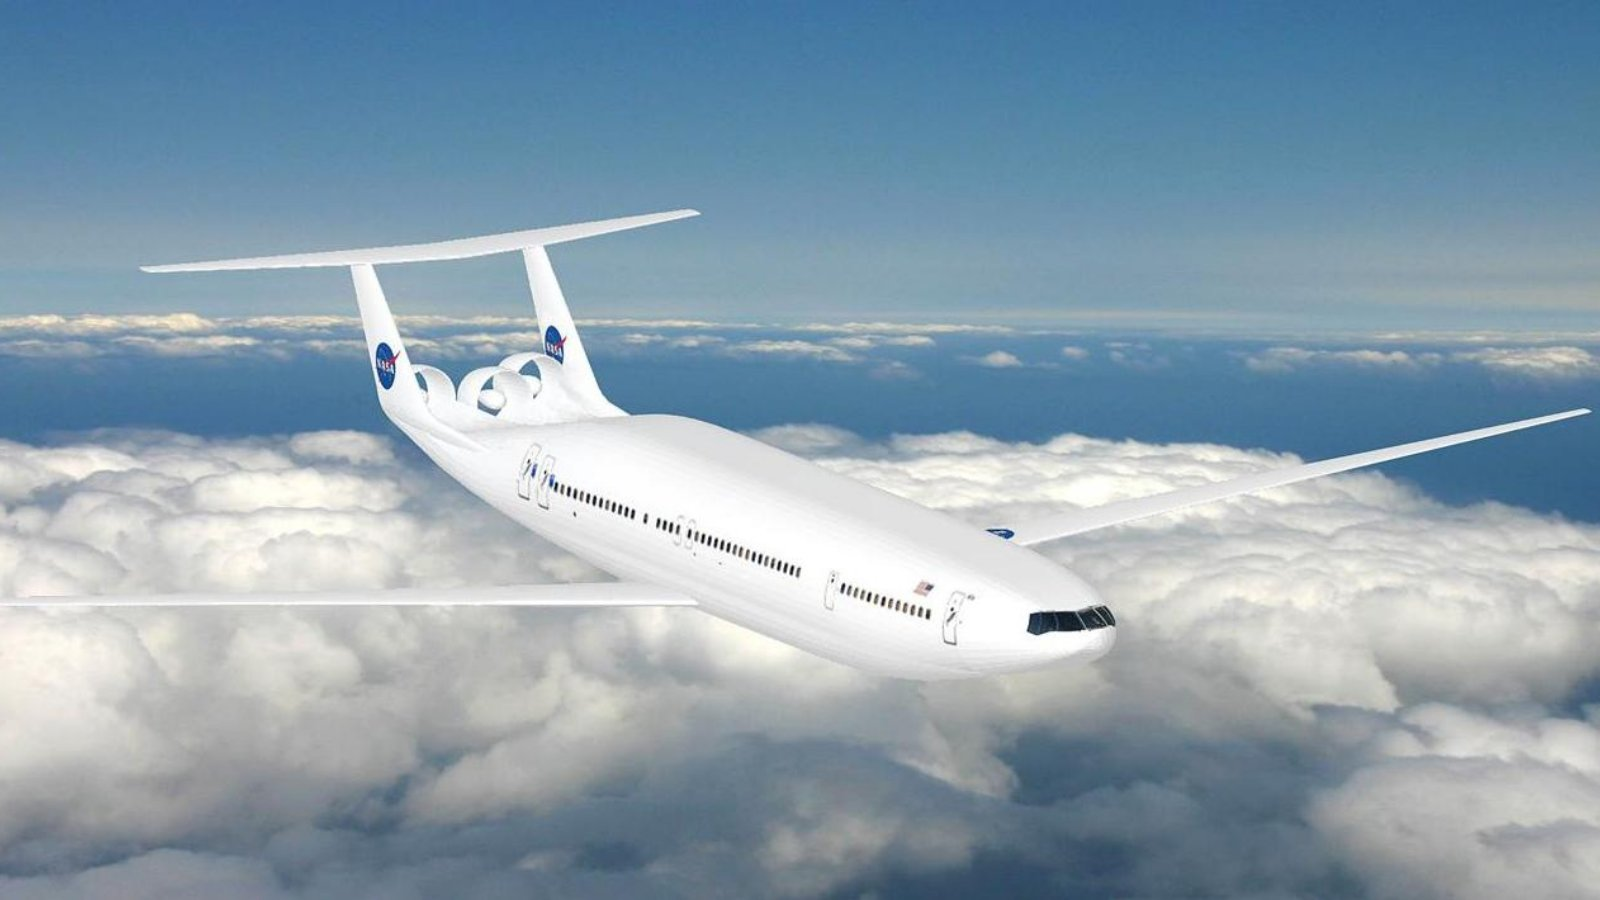 Double Bubble, o avião D8 do MIT.